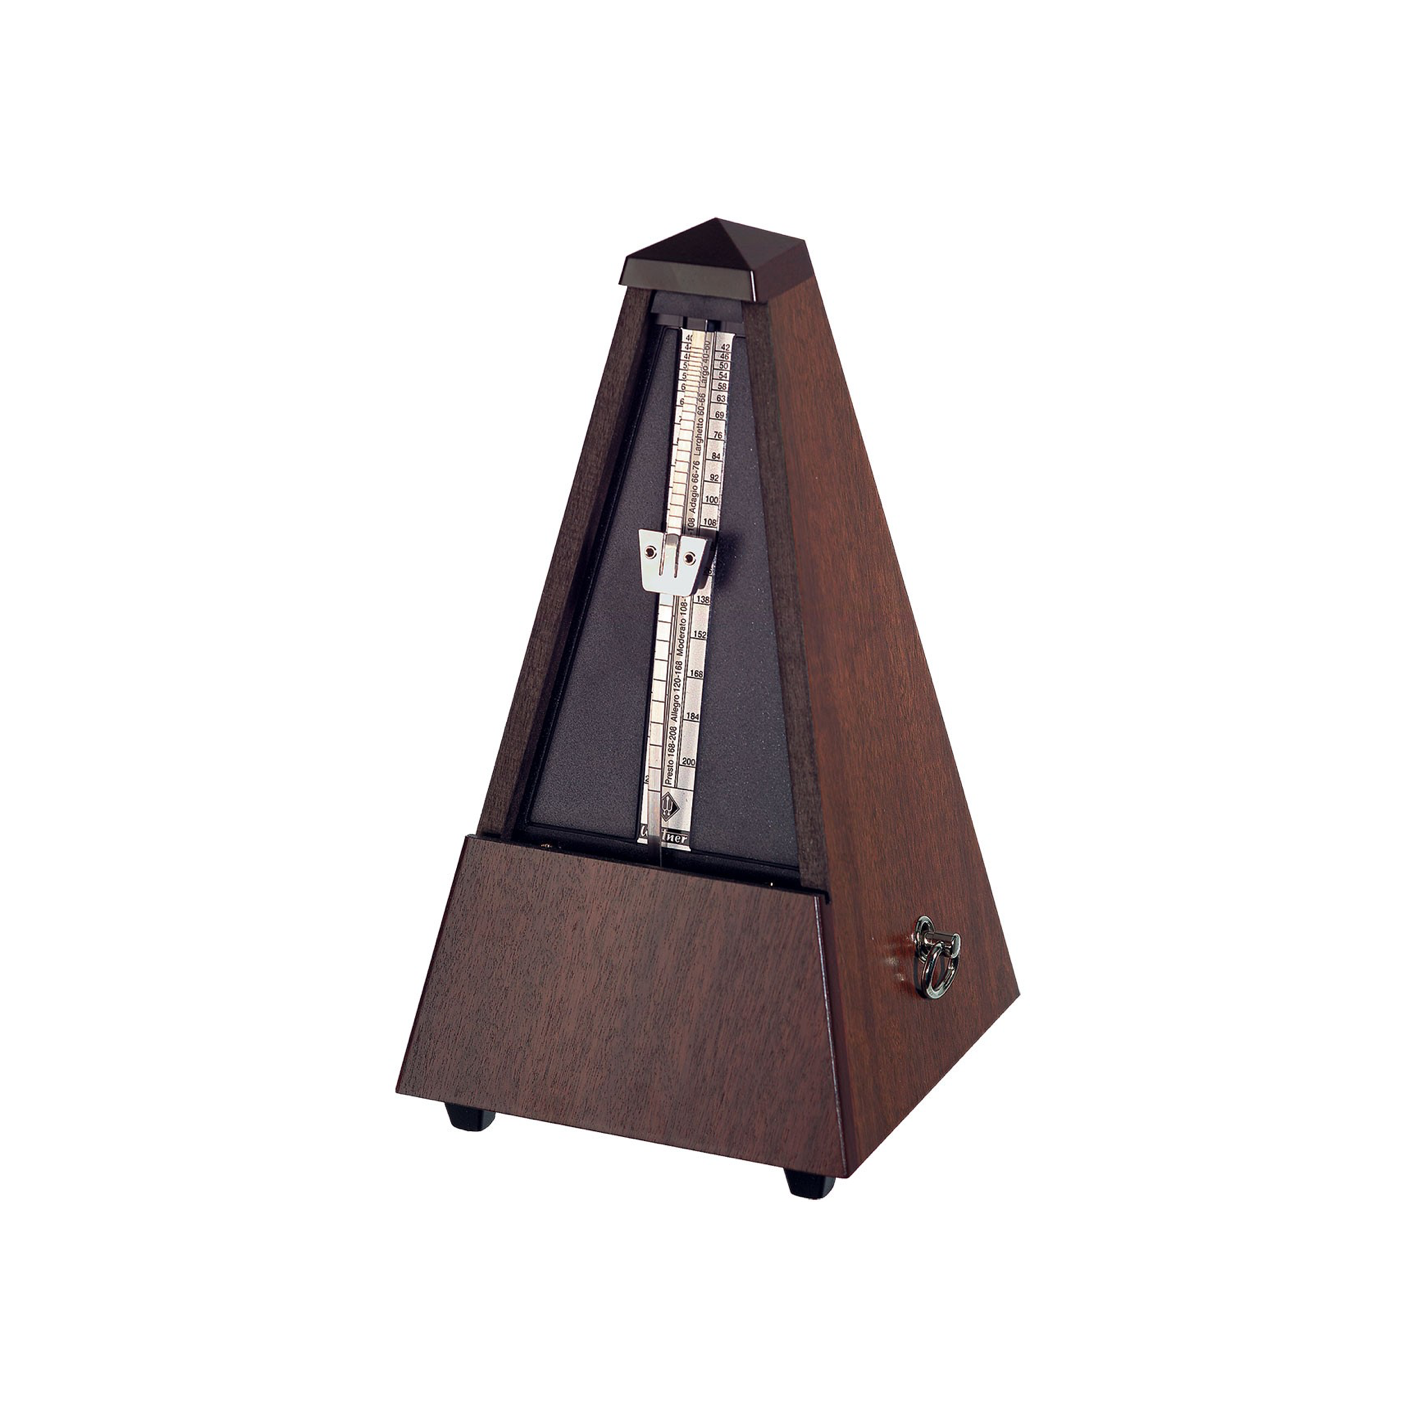 Wittner 804 Genuine Walnut High Gloss No Bell Metronome